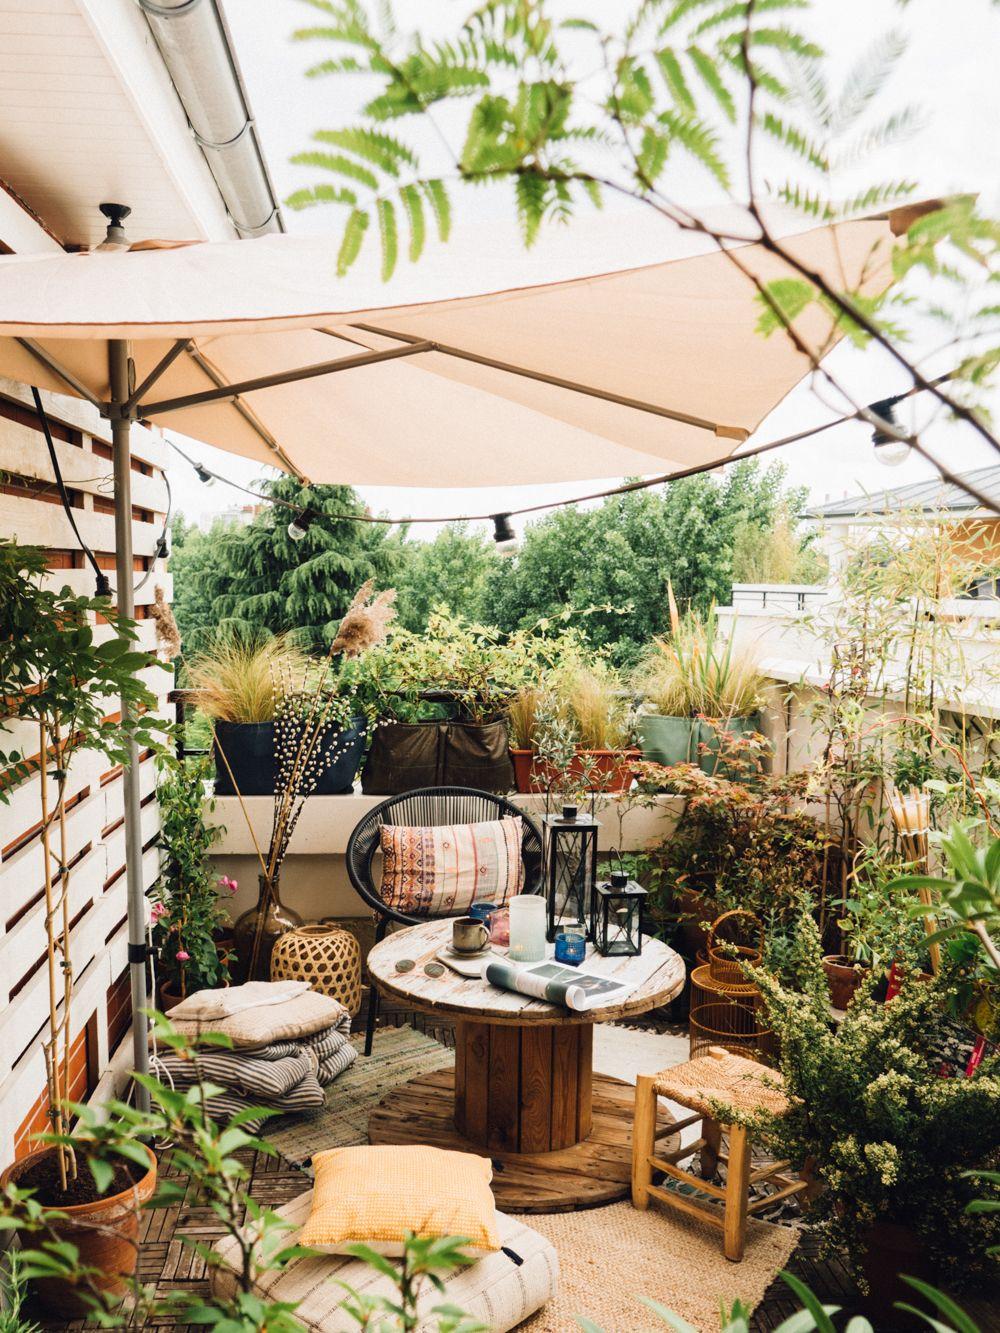 notre terrasse boh me jardin d coration du balcon d. Black Bedroom Furniture Sets. Home Design Ideas